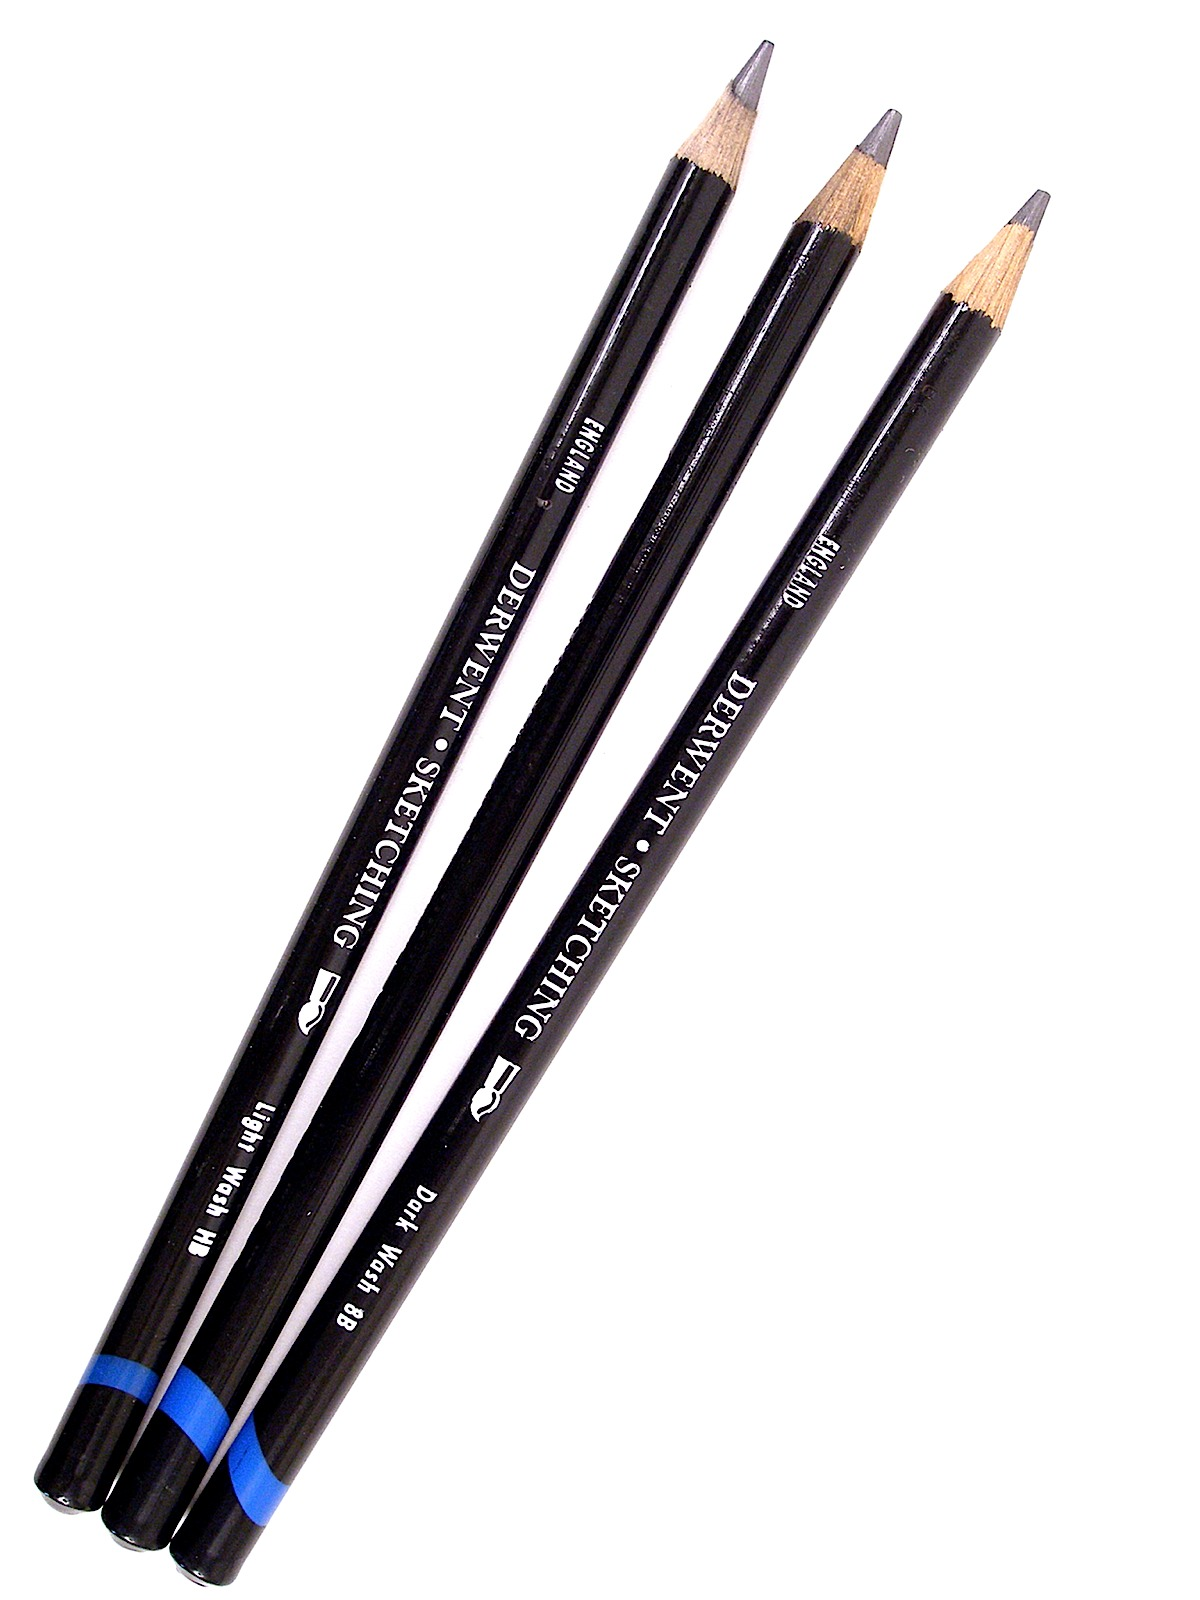 Derwent Water-soluble Sketching Pencils